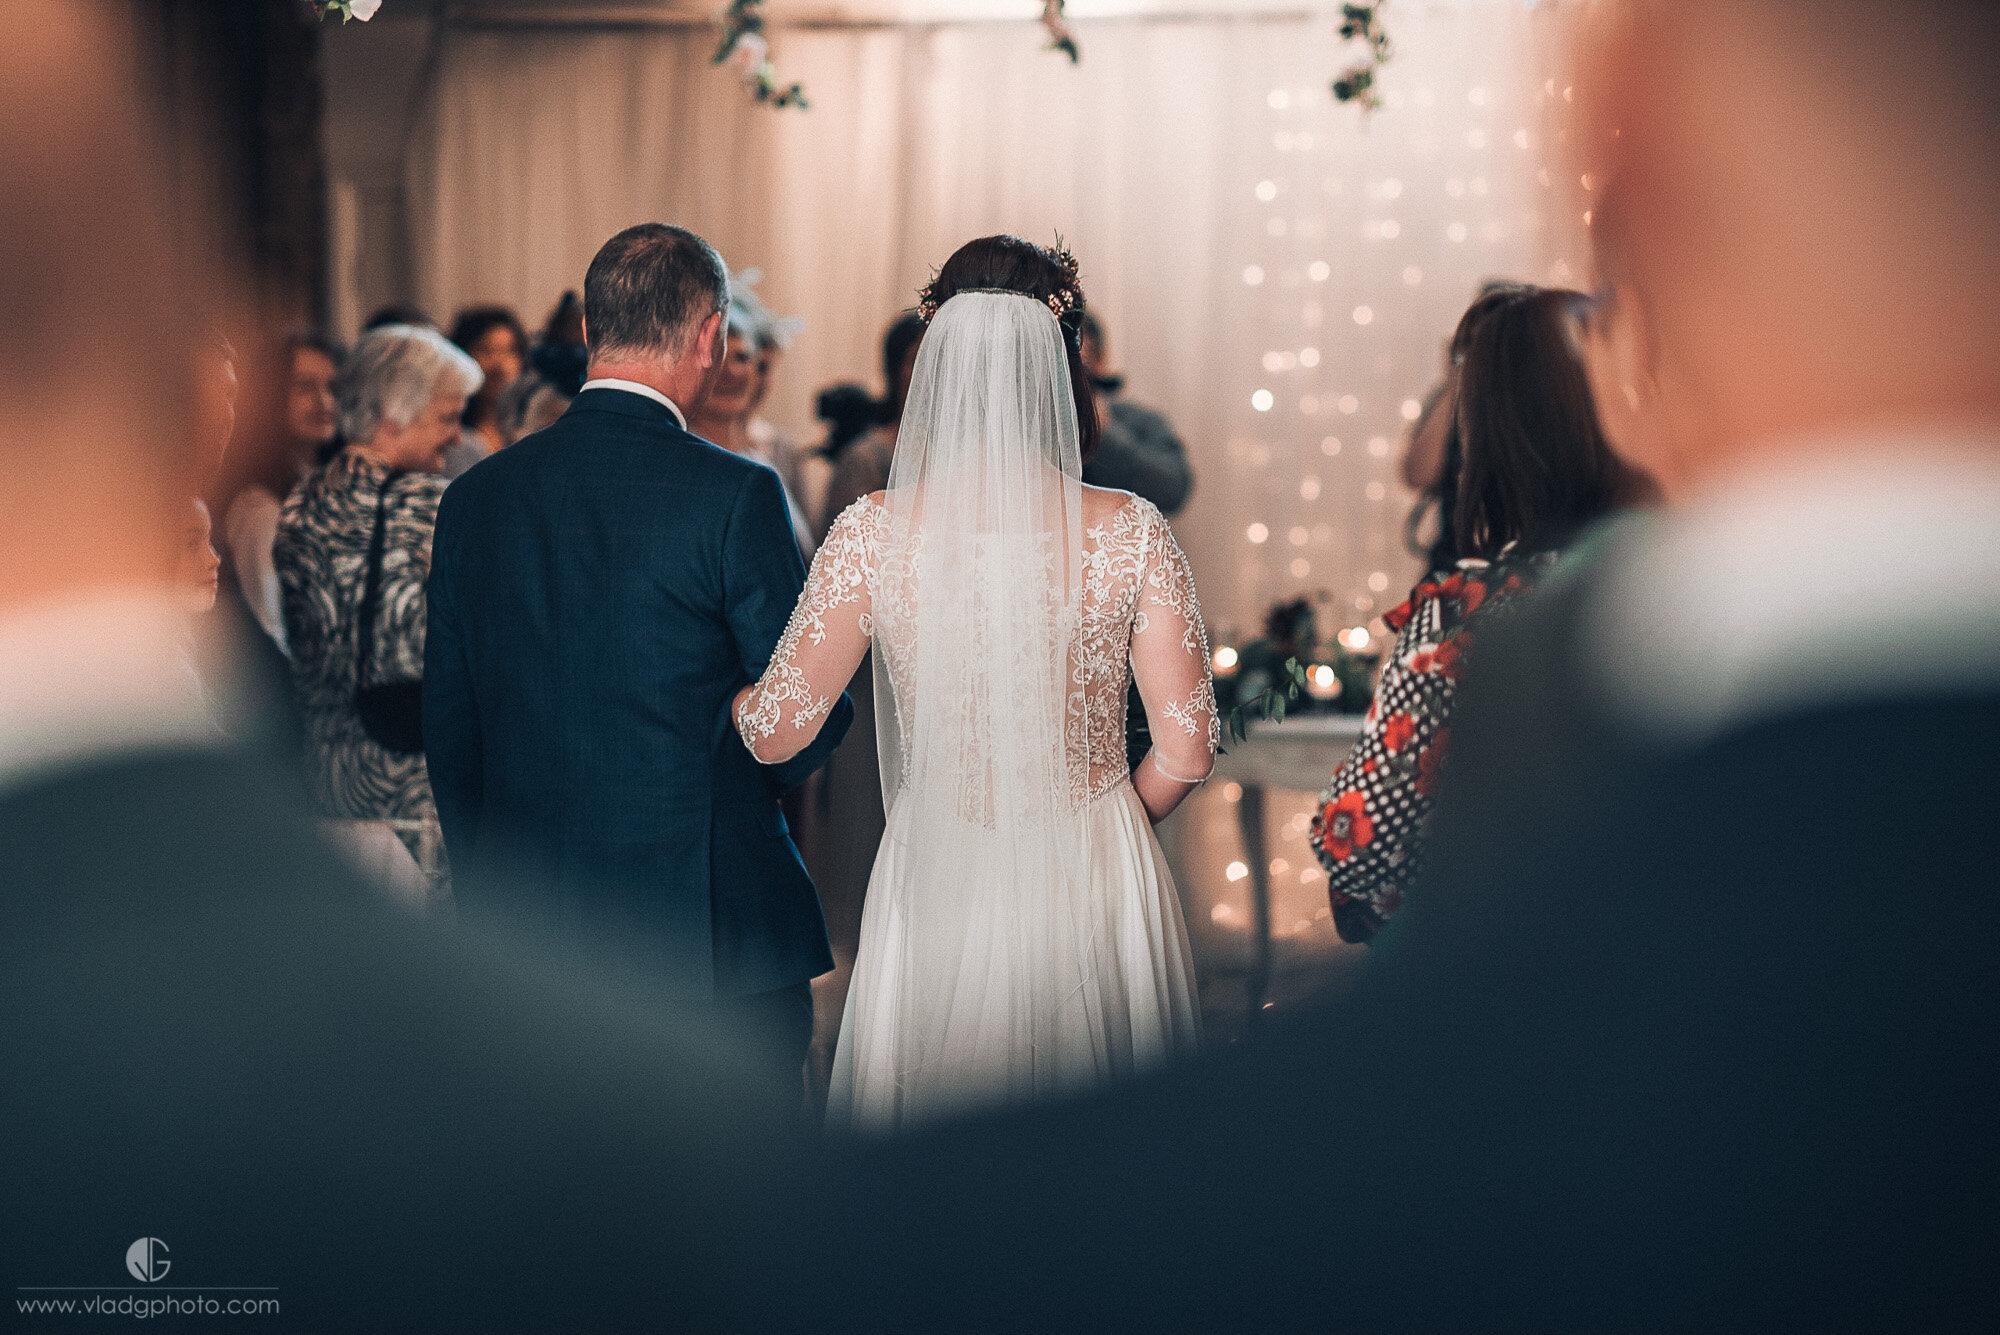 Stirk House Hotel Wedding Photography_9.jpg